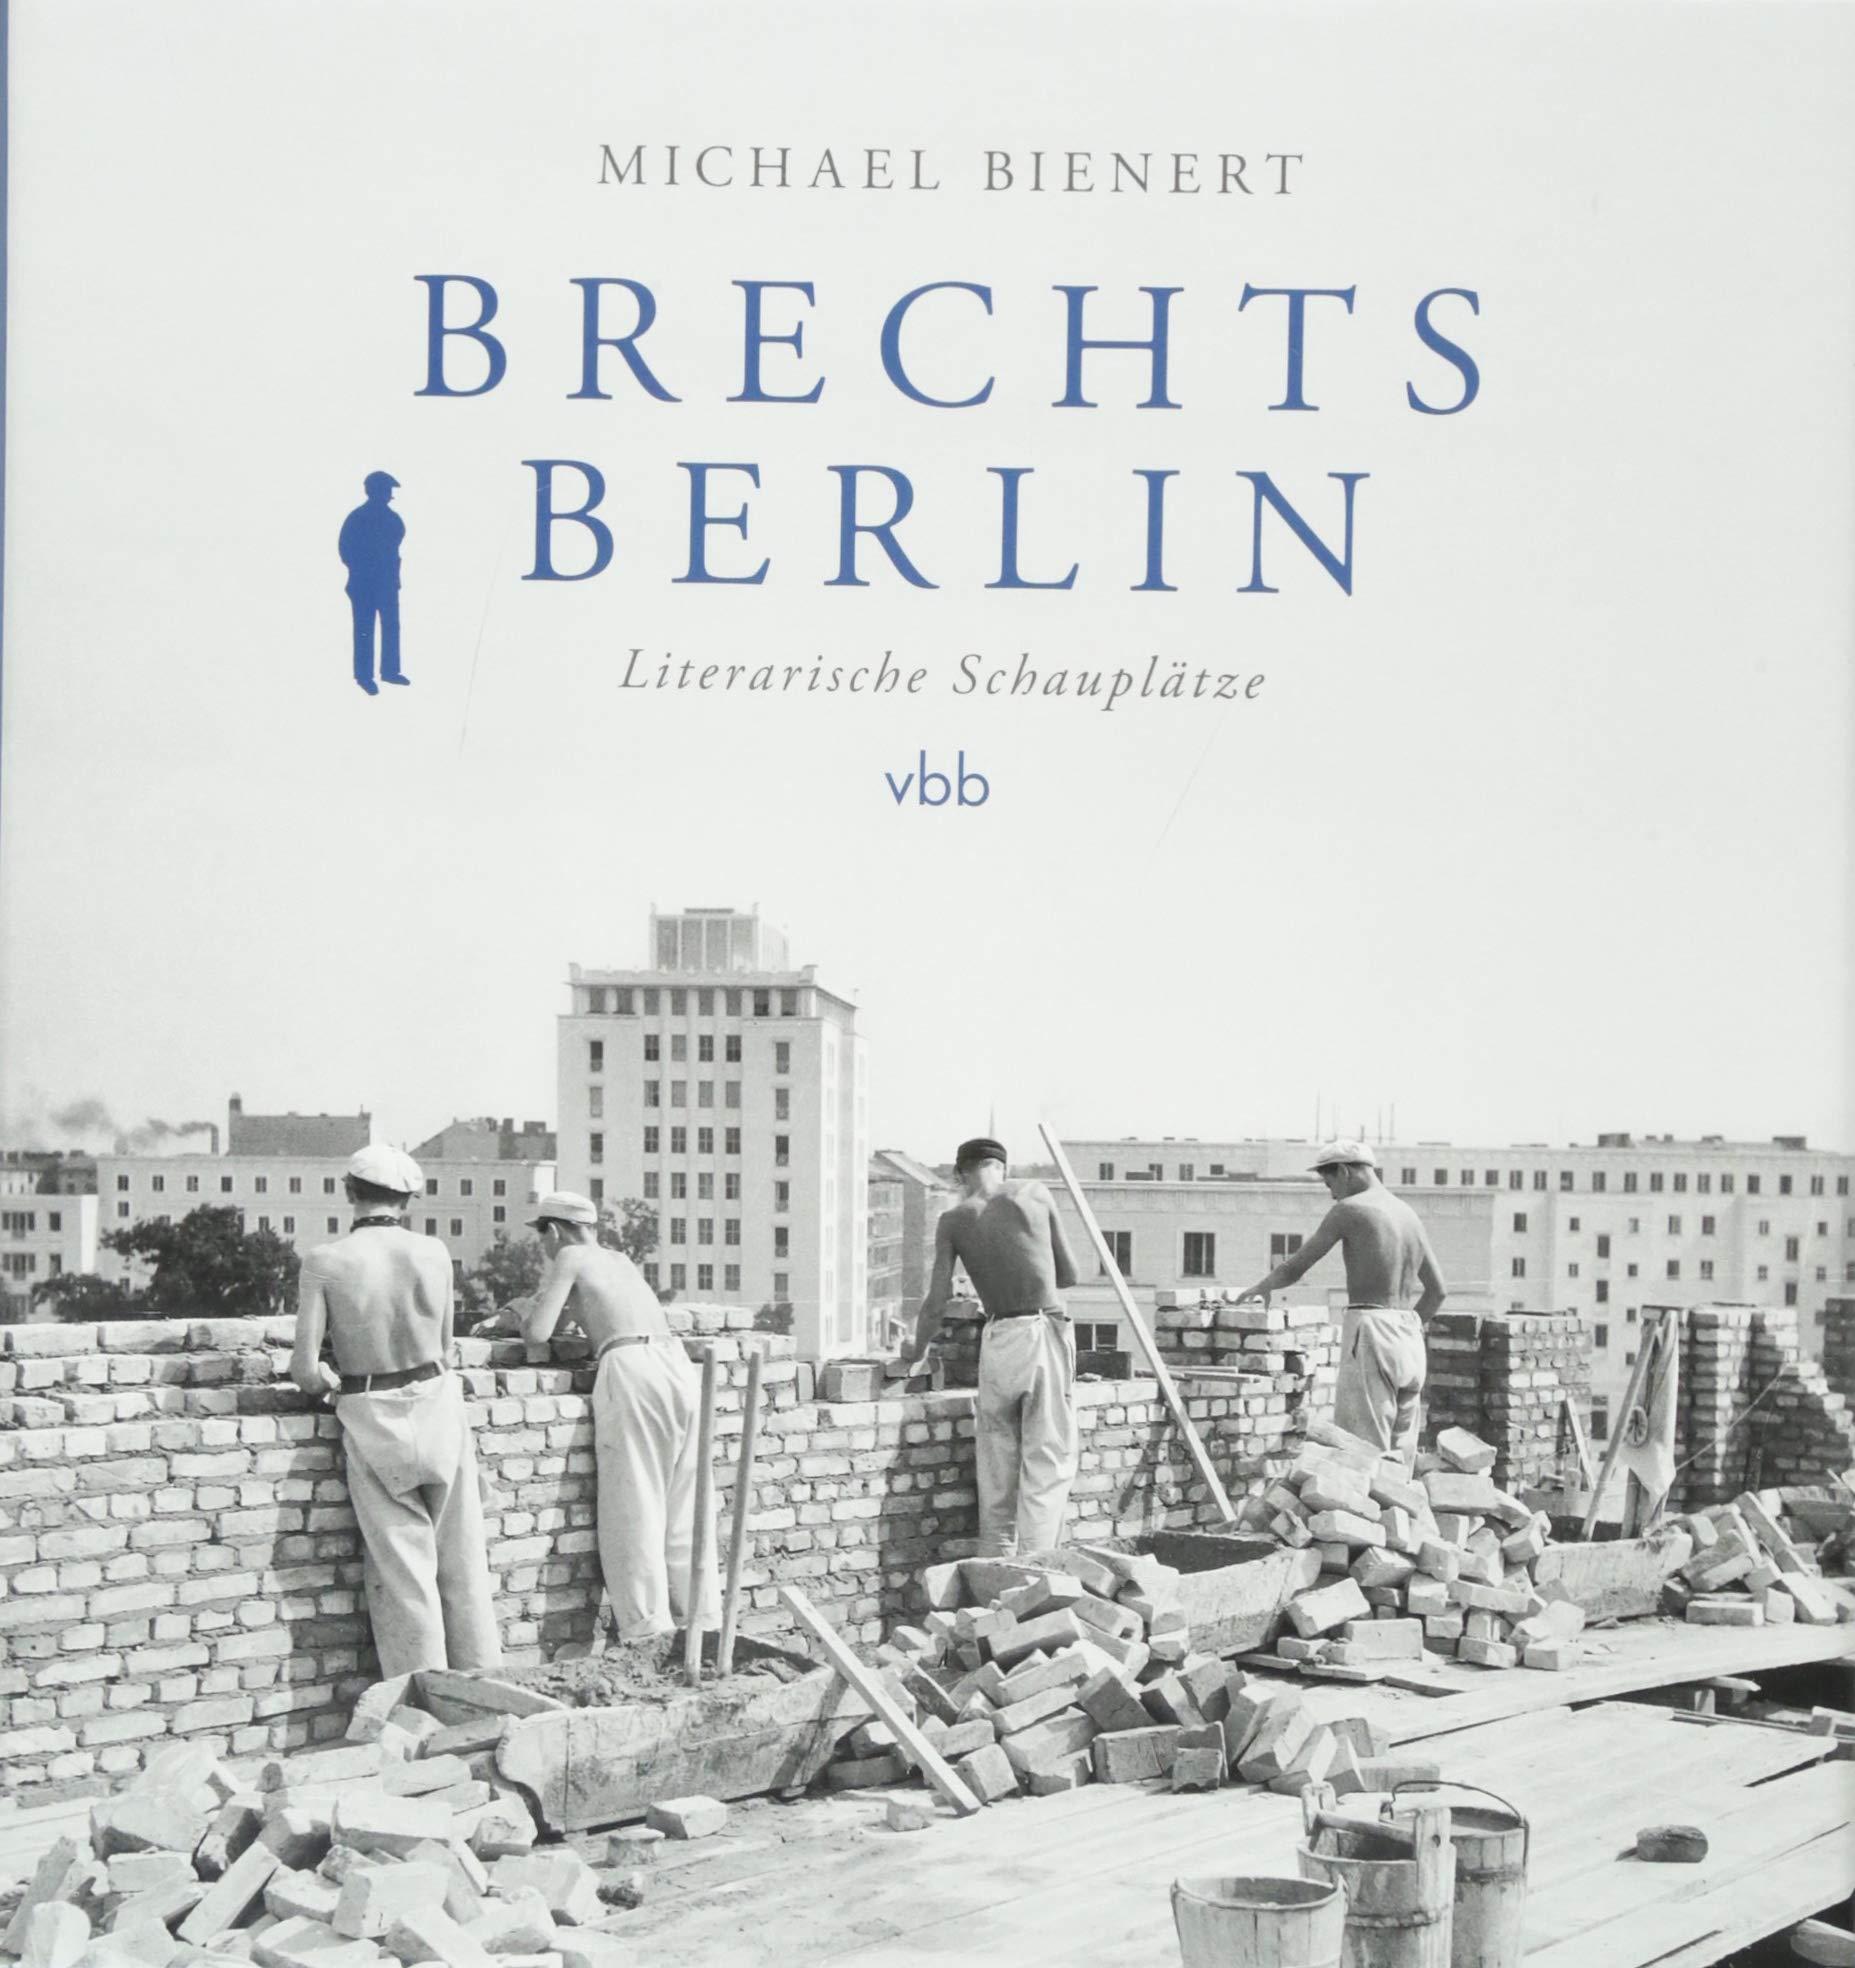 Brechts Berlin Literarische Schauplätze Amazonde Michael Bienert